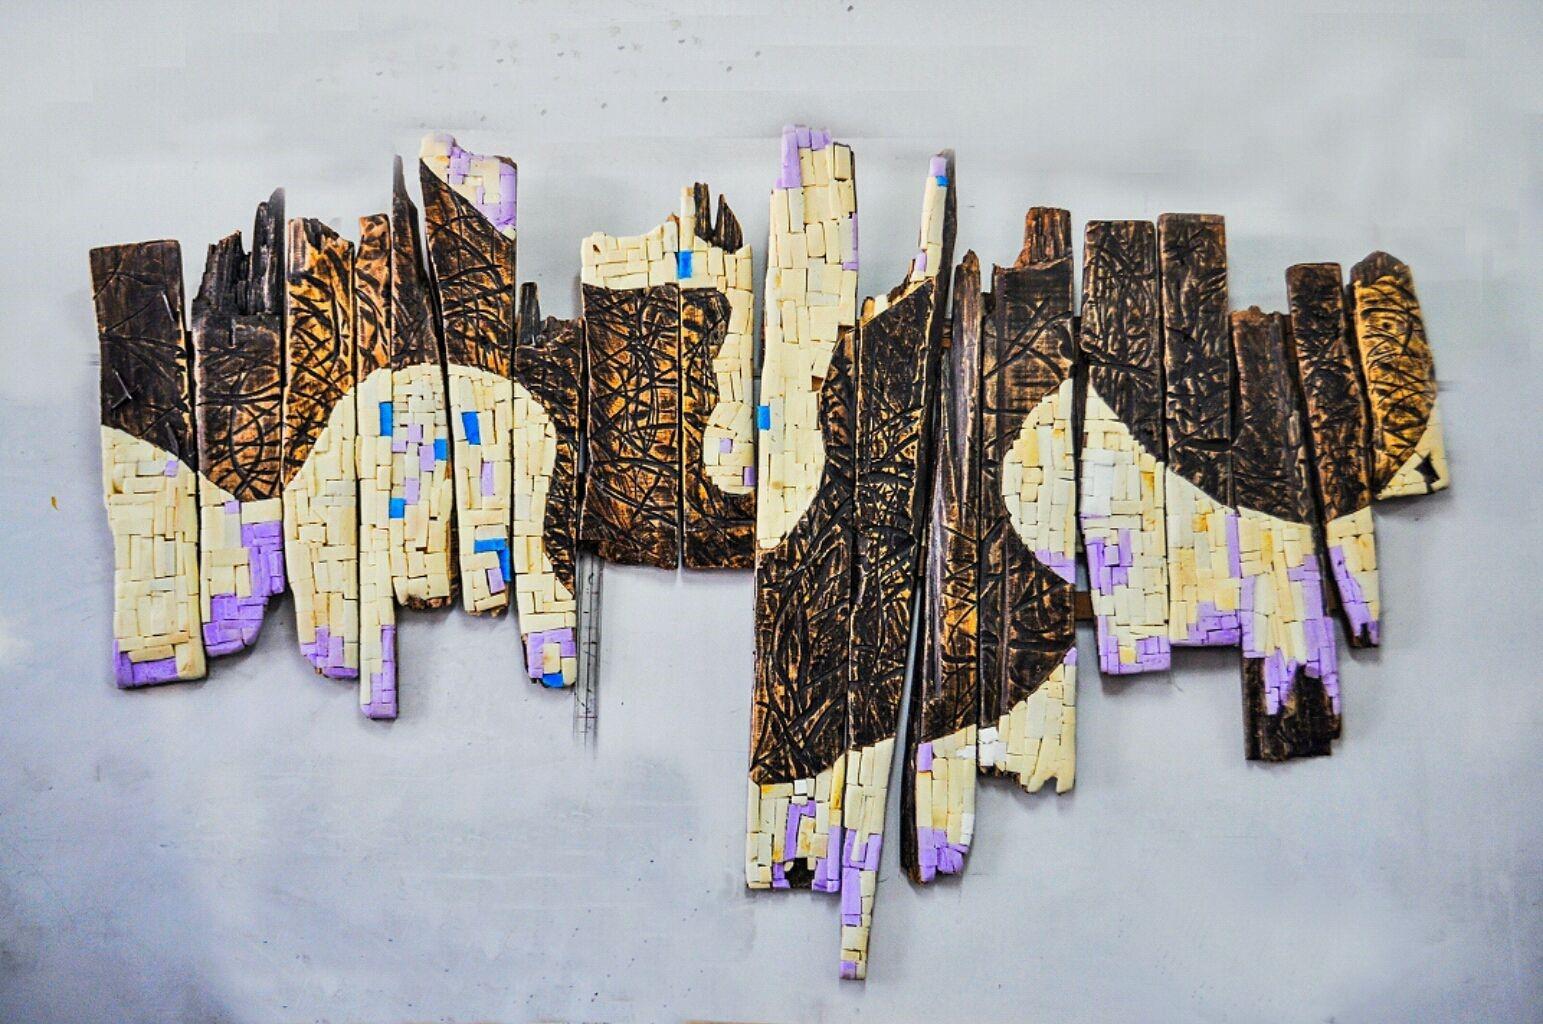 Akuba II, 2019, Mixed media, træ og flamingo, 100 x 232 cm